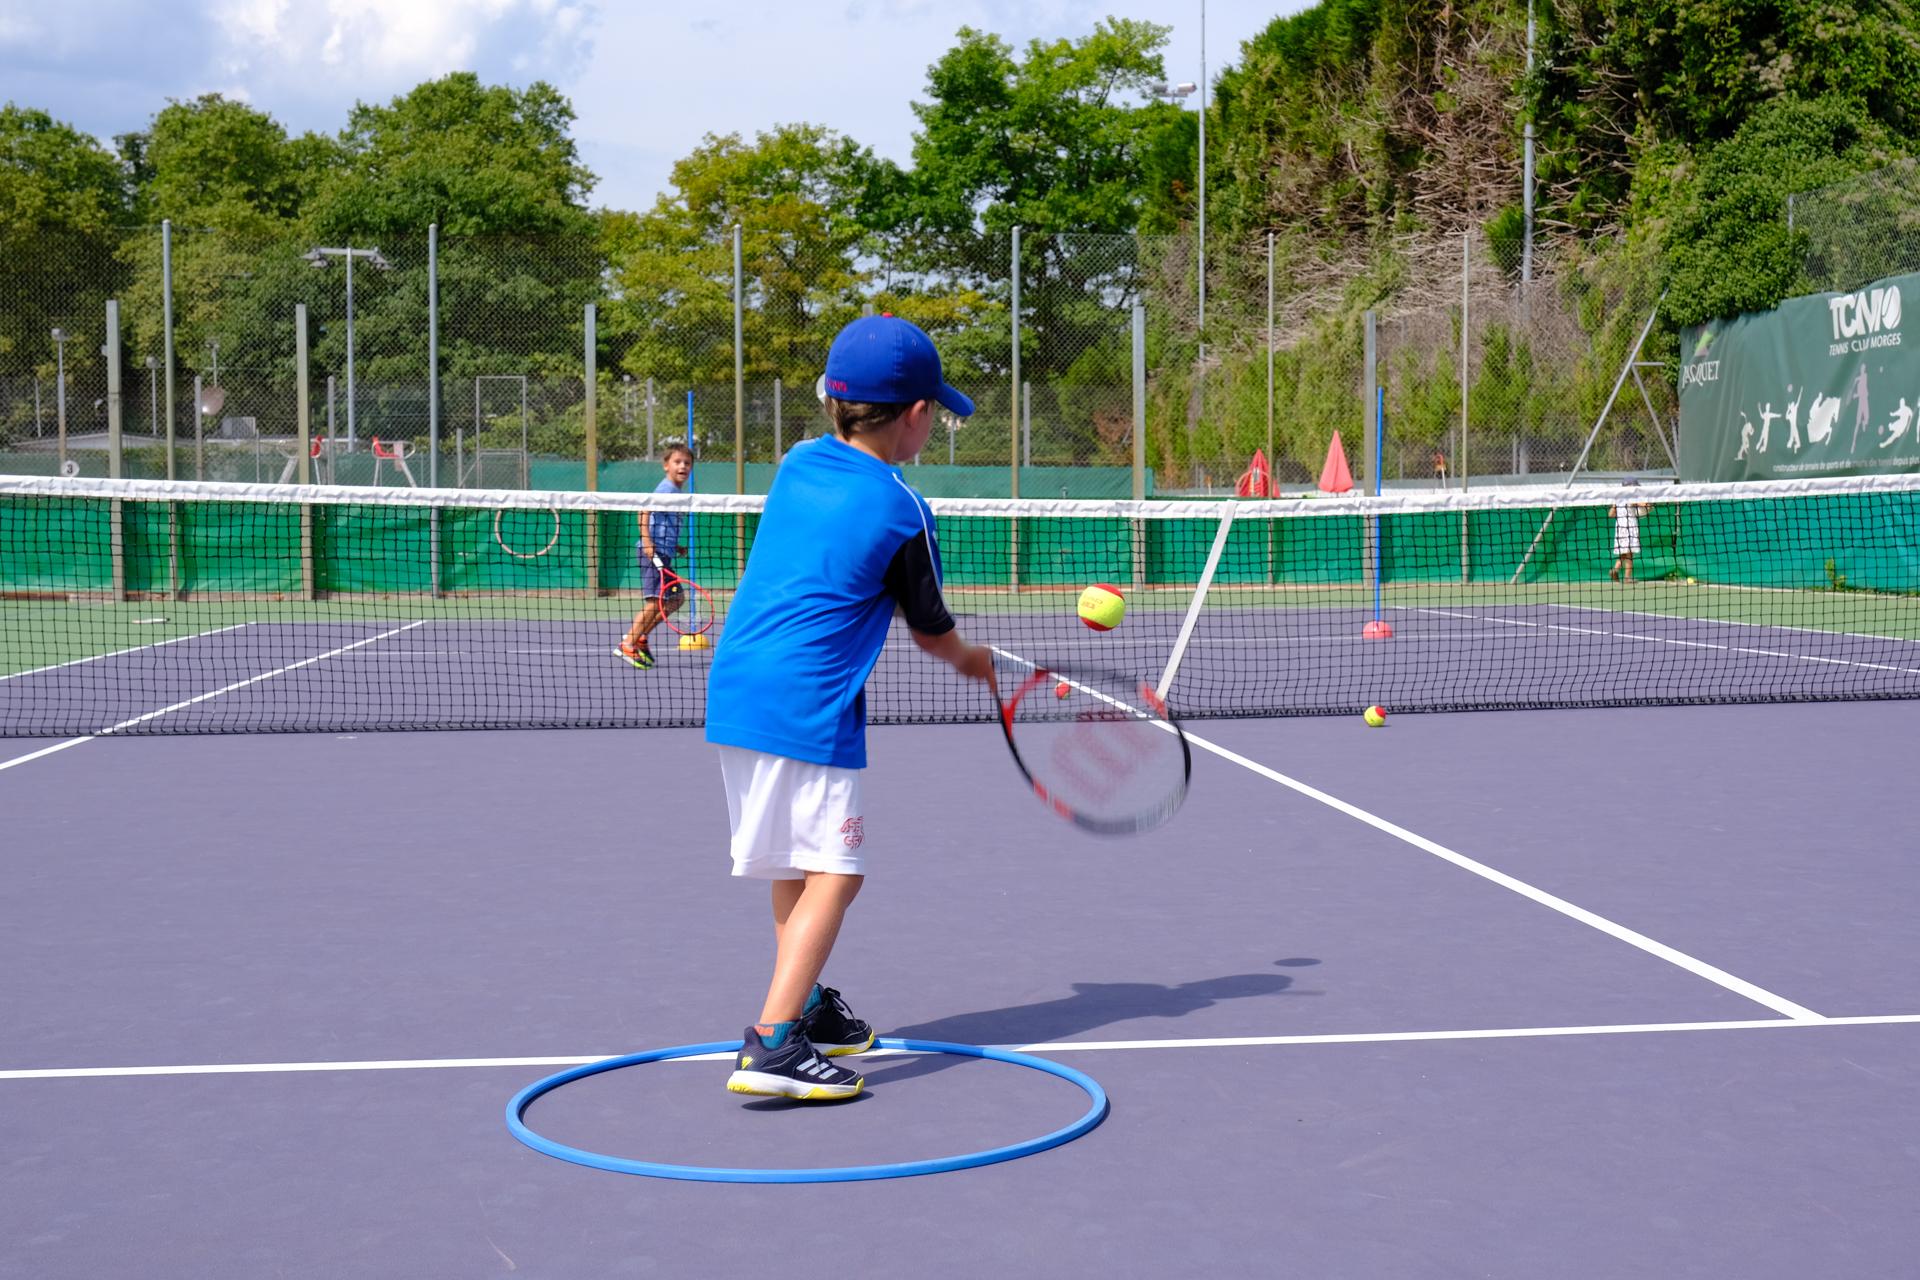 2019-08-27_tennis-Morges-4